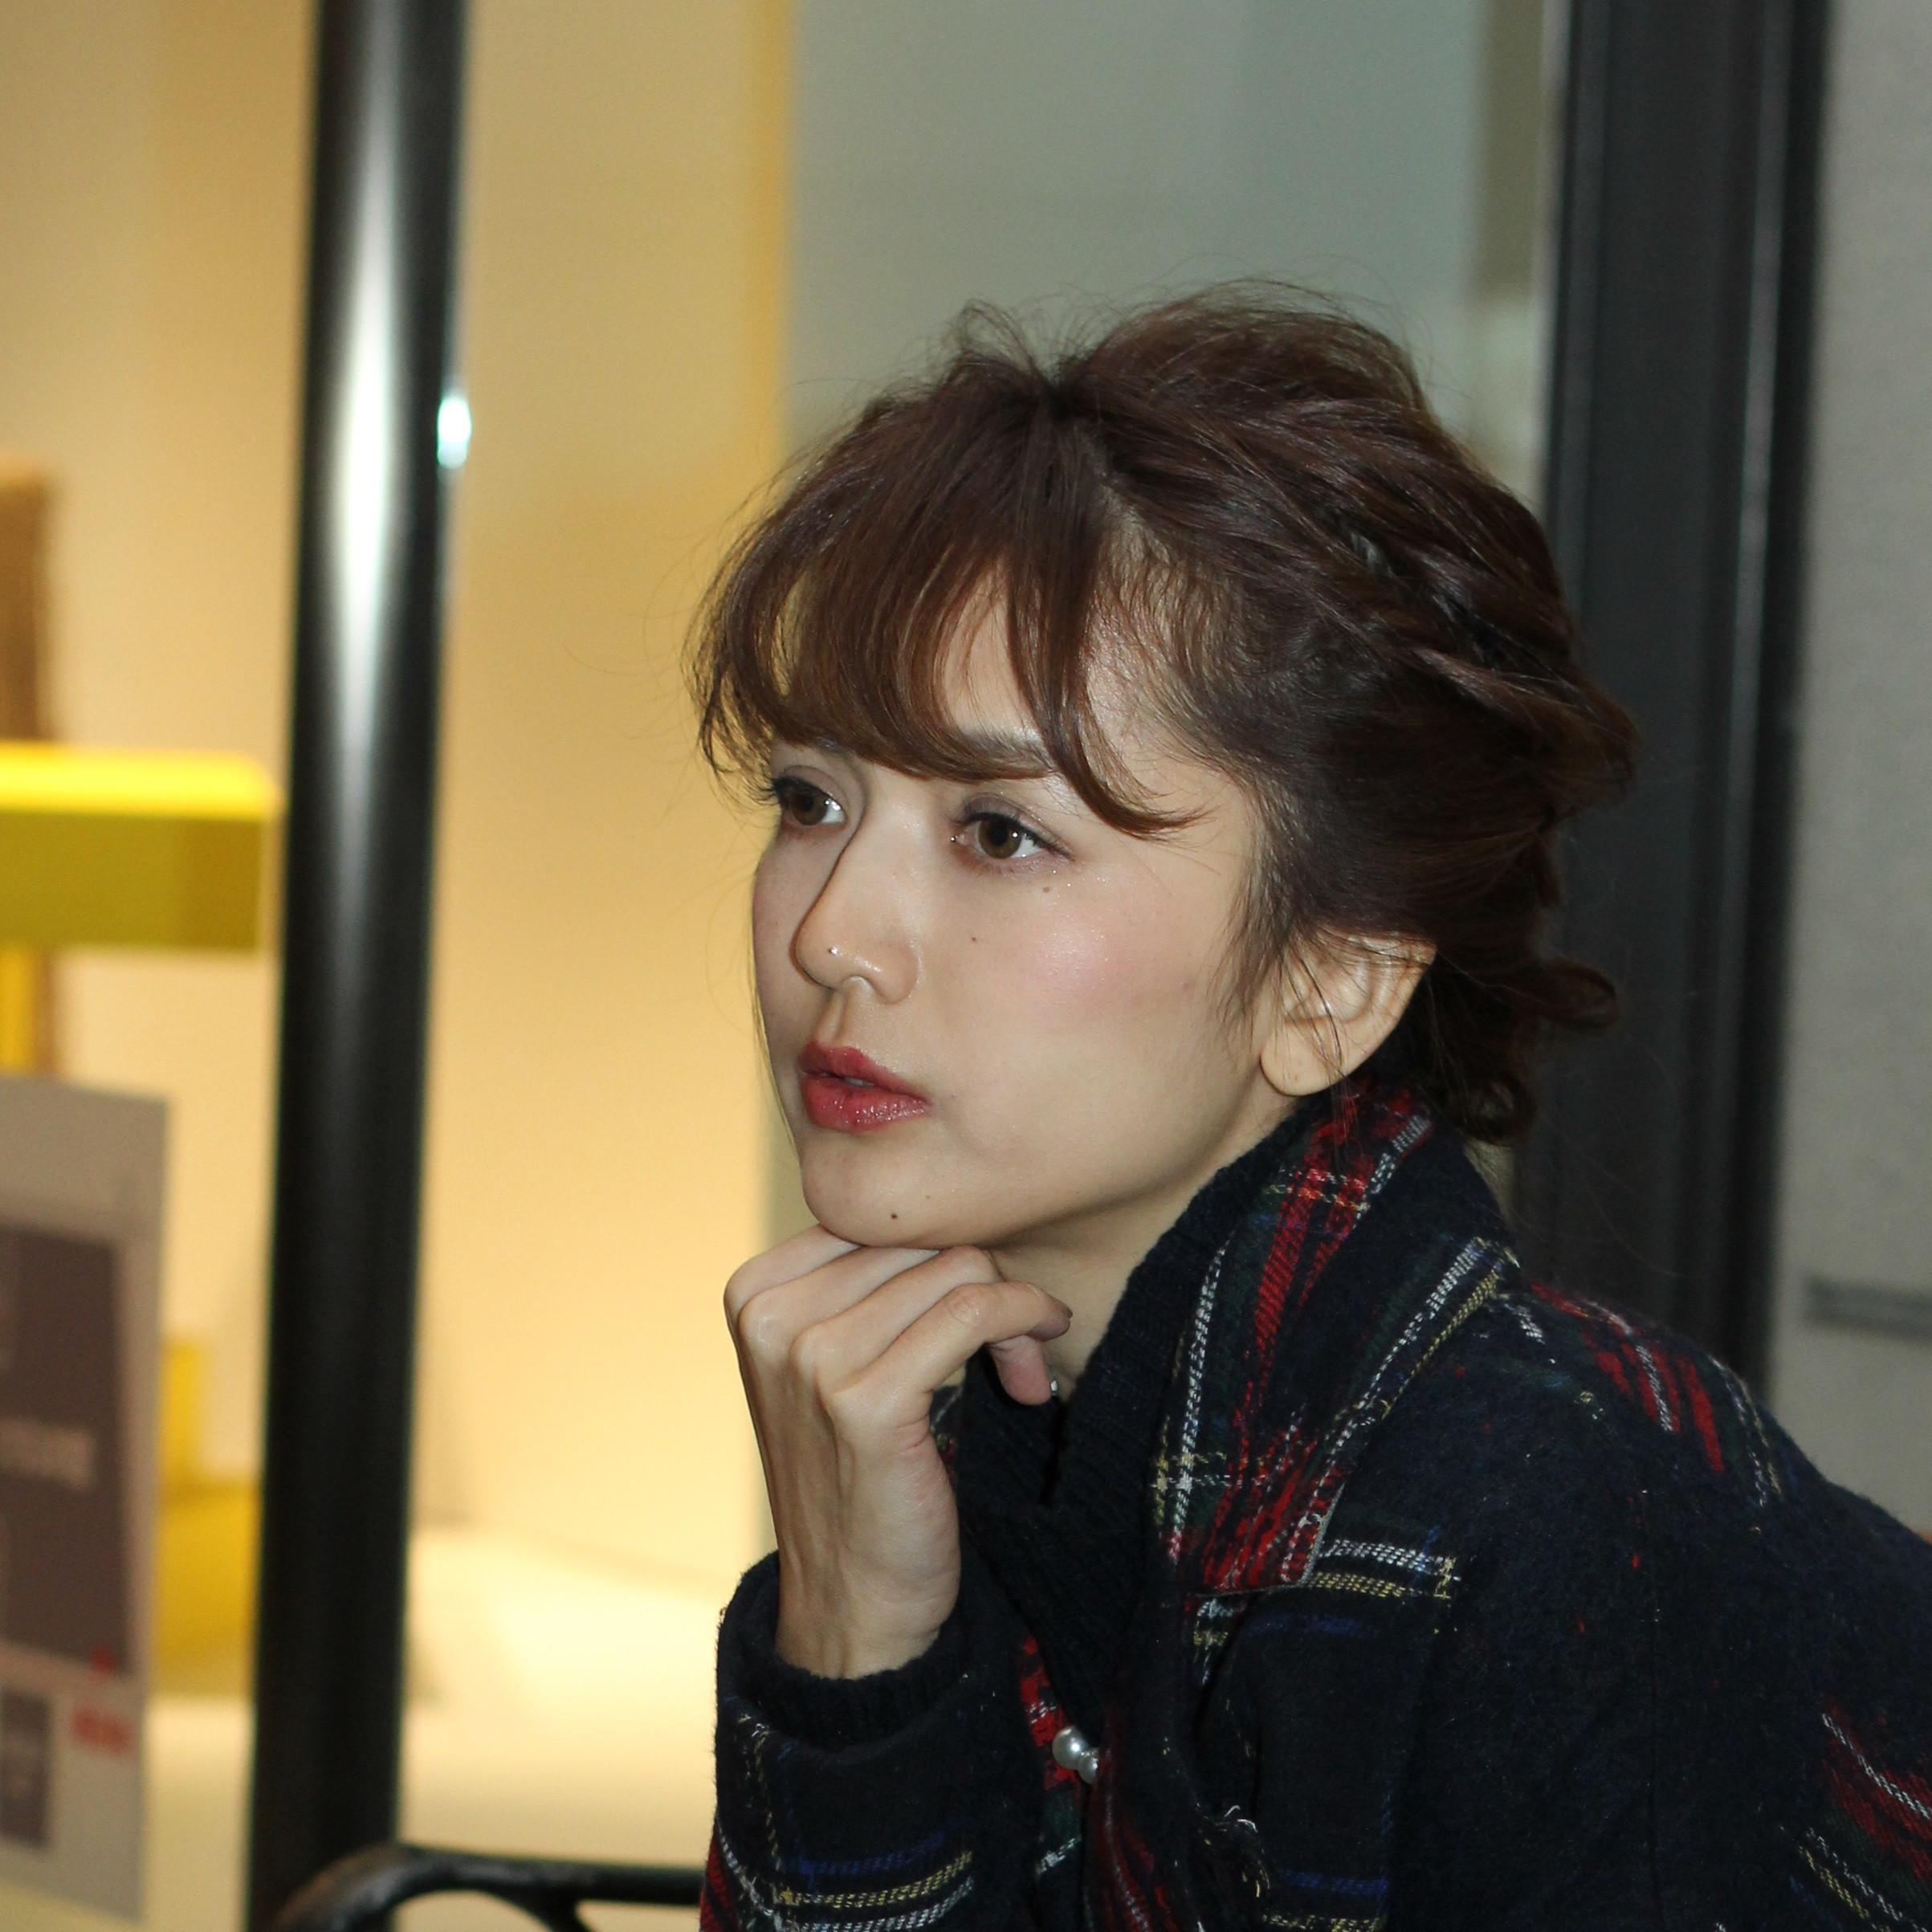 #06【HAIR特別企画】自分に素直に生きる。そして気になる恋の結末は?